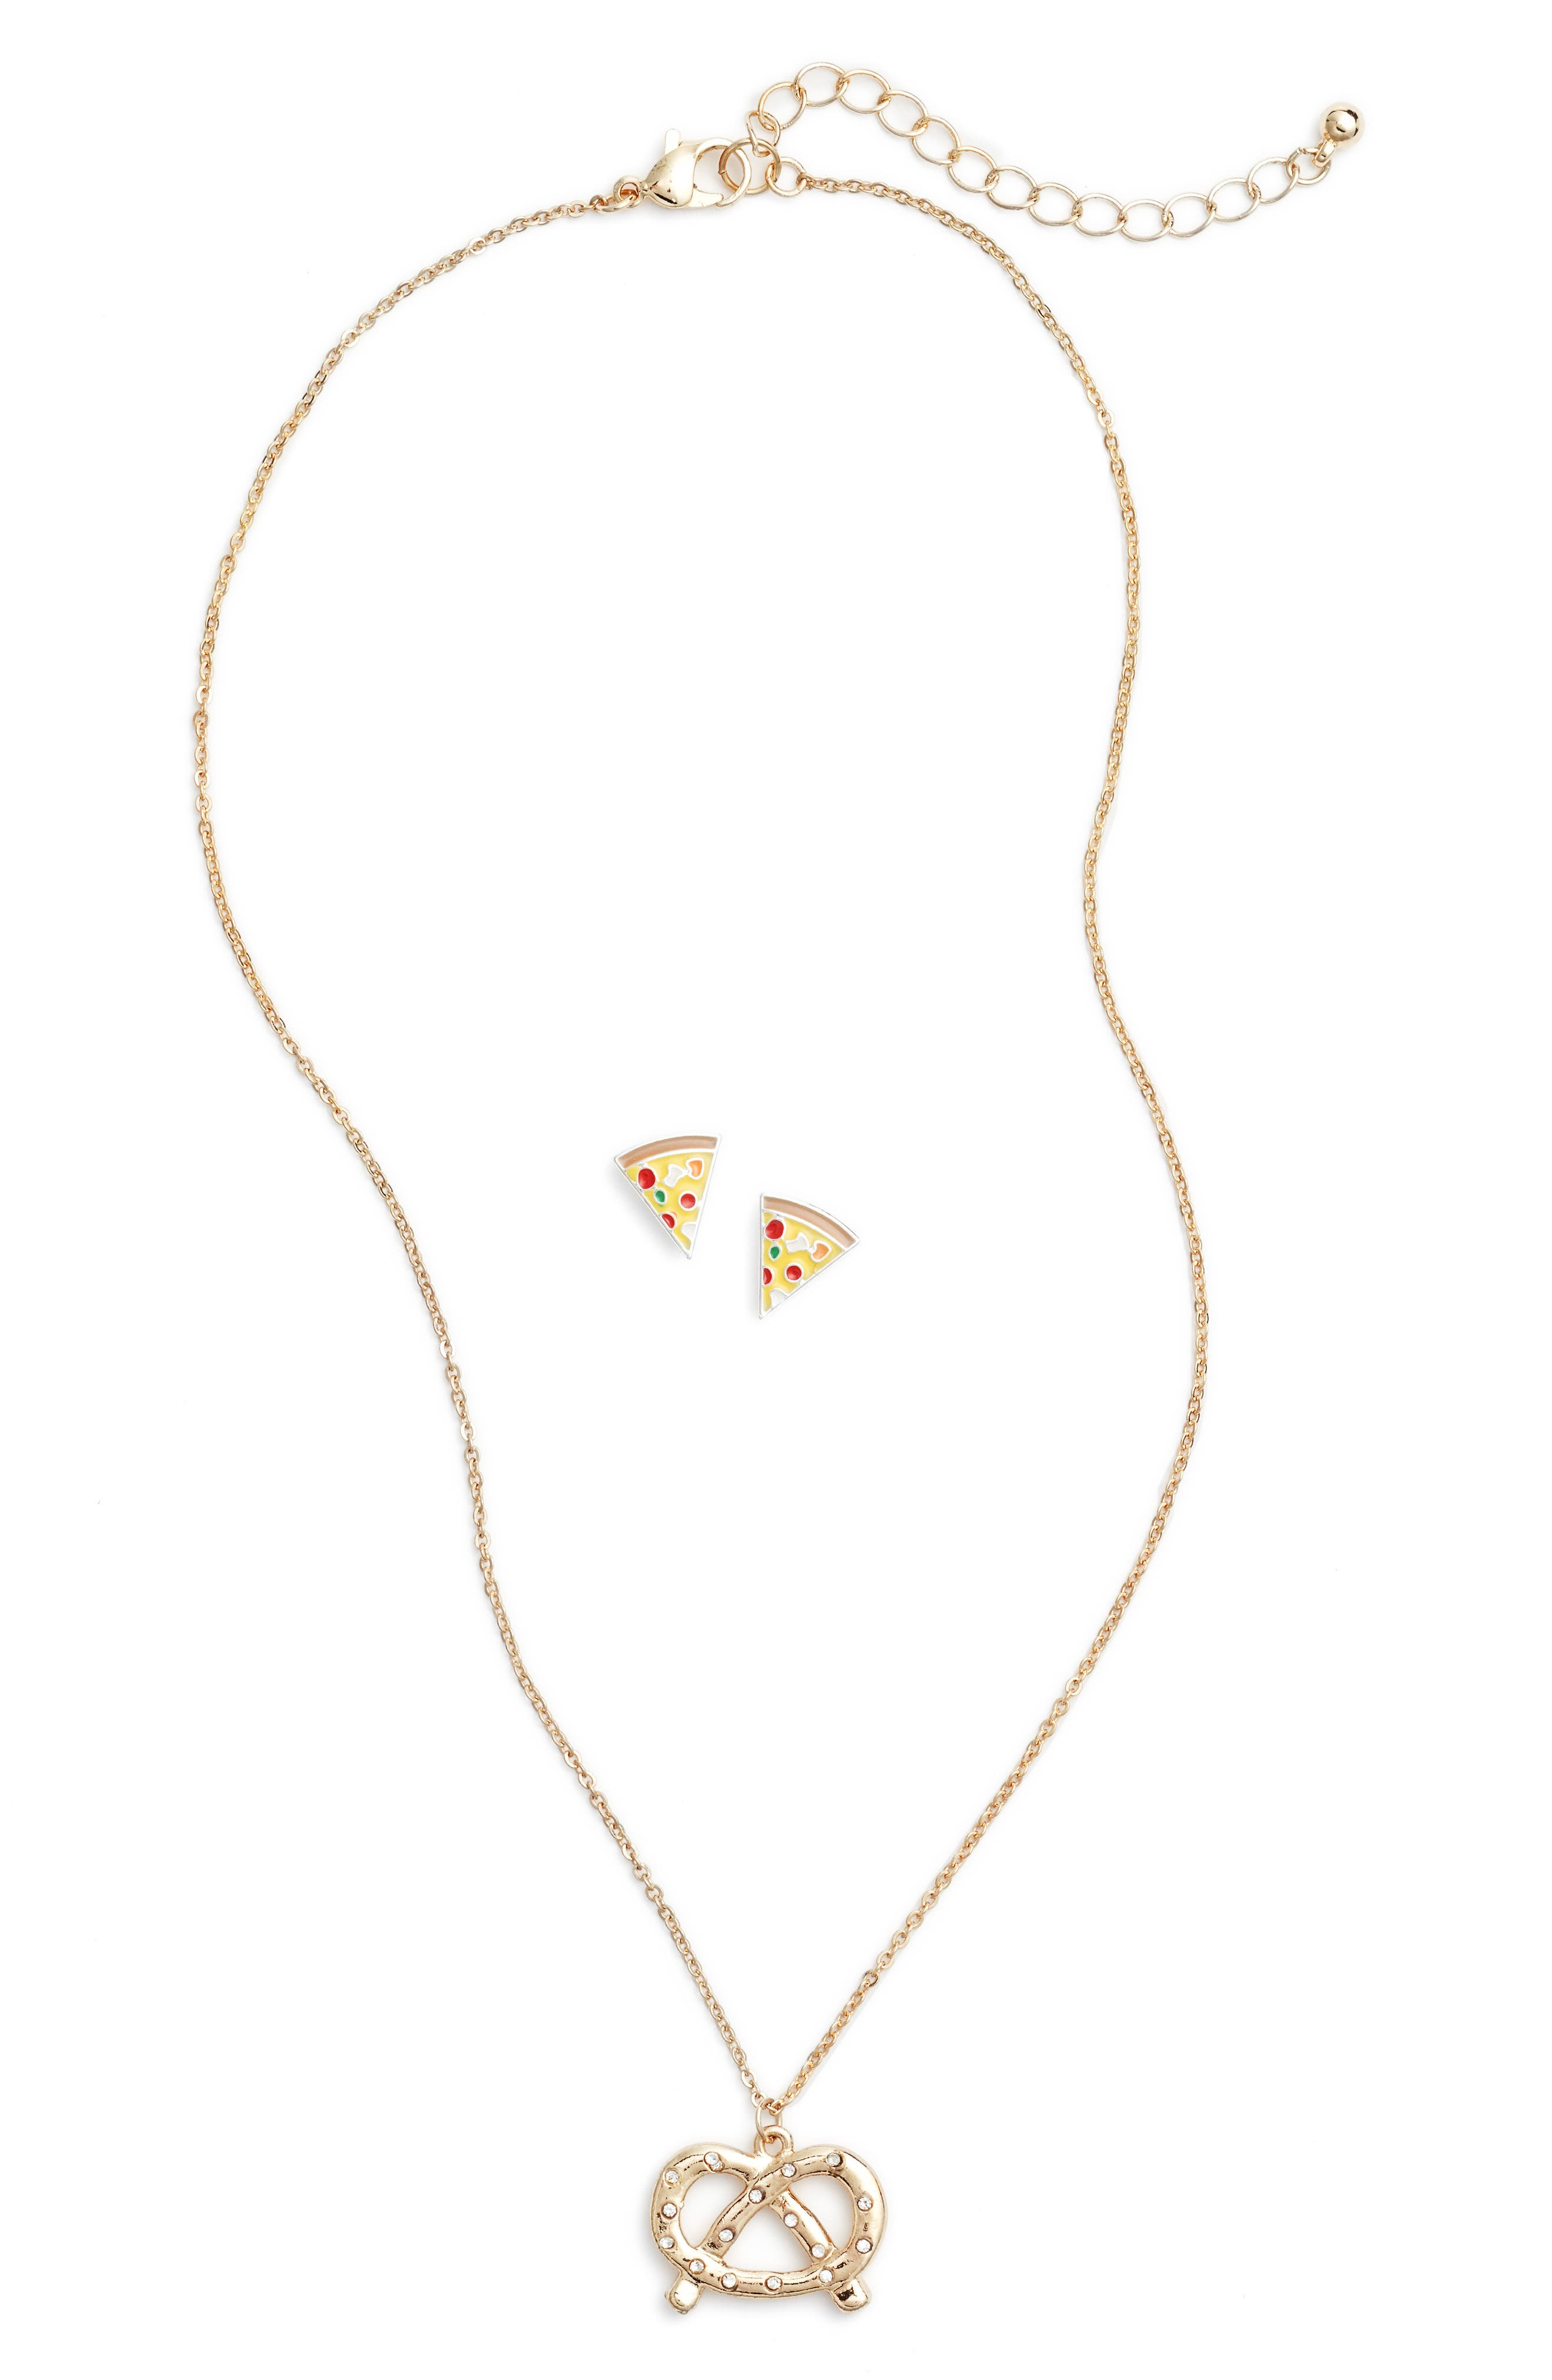 Main Image - Capelli New York Pug Love Pendant Necklace & Earrings Set (Girls)